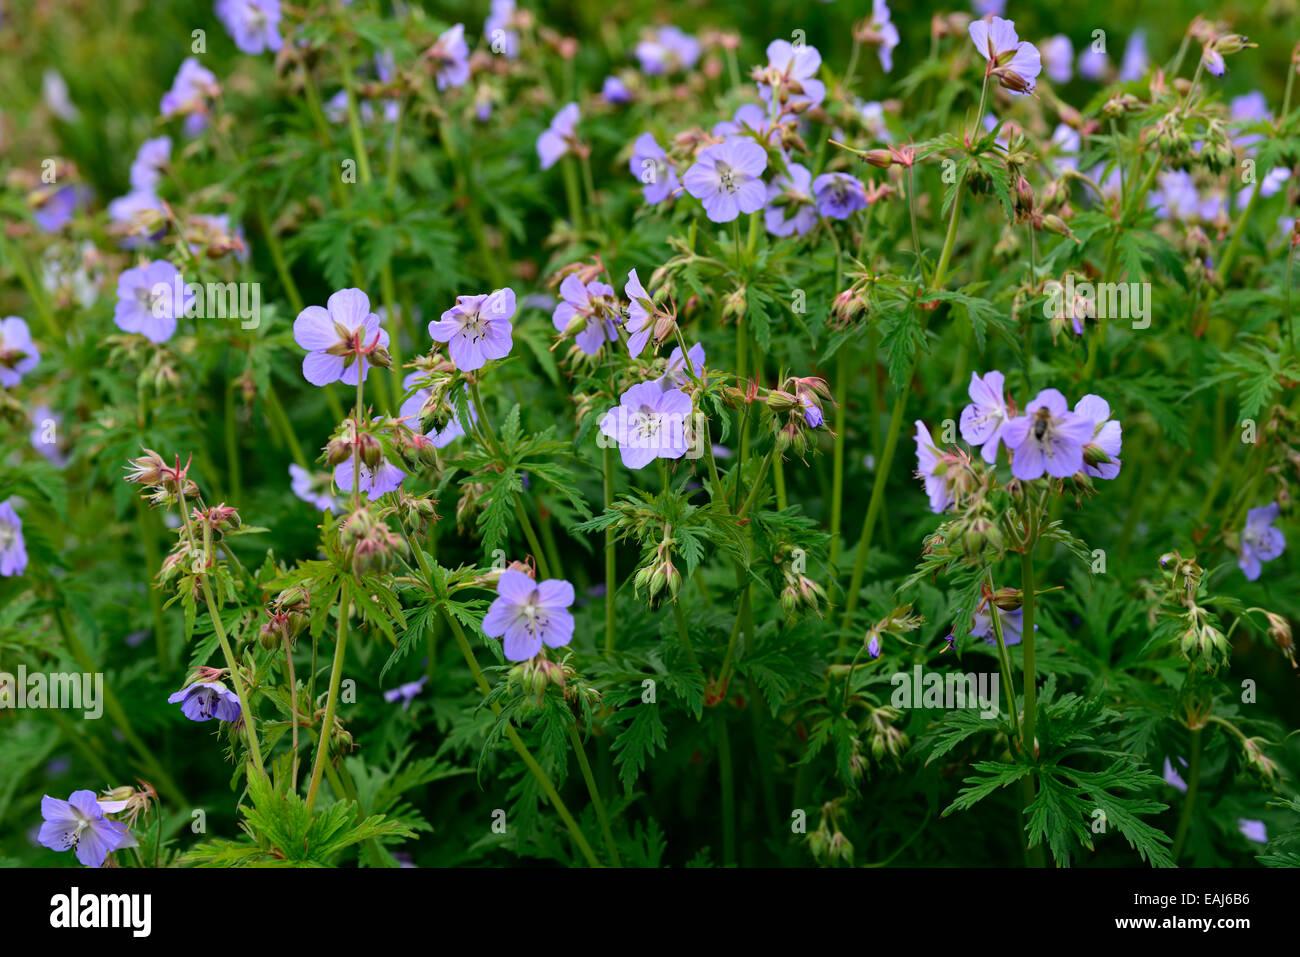 Geranium Pratense Mrs Kendall Clark Blue Flower Flowers Flowering